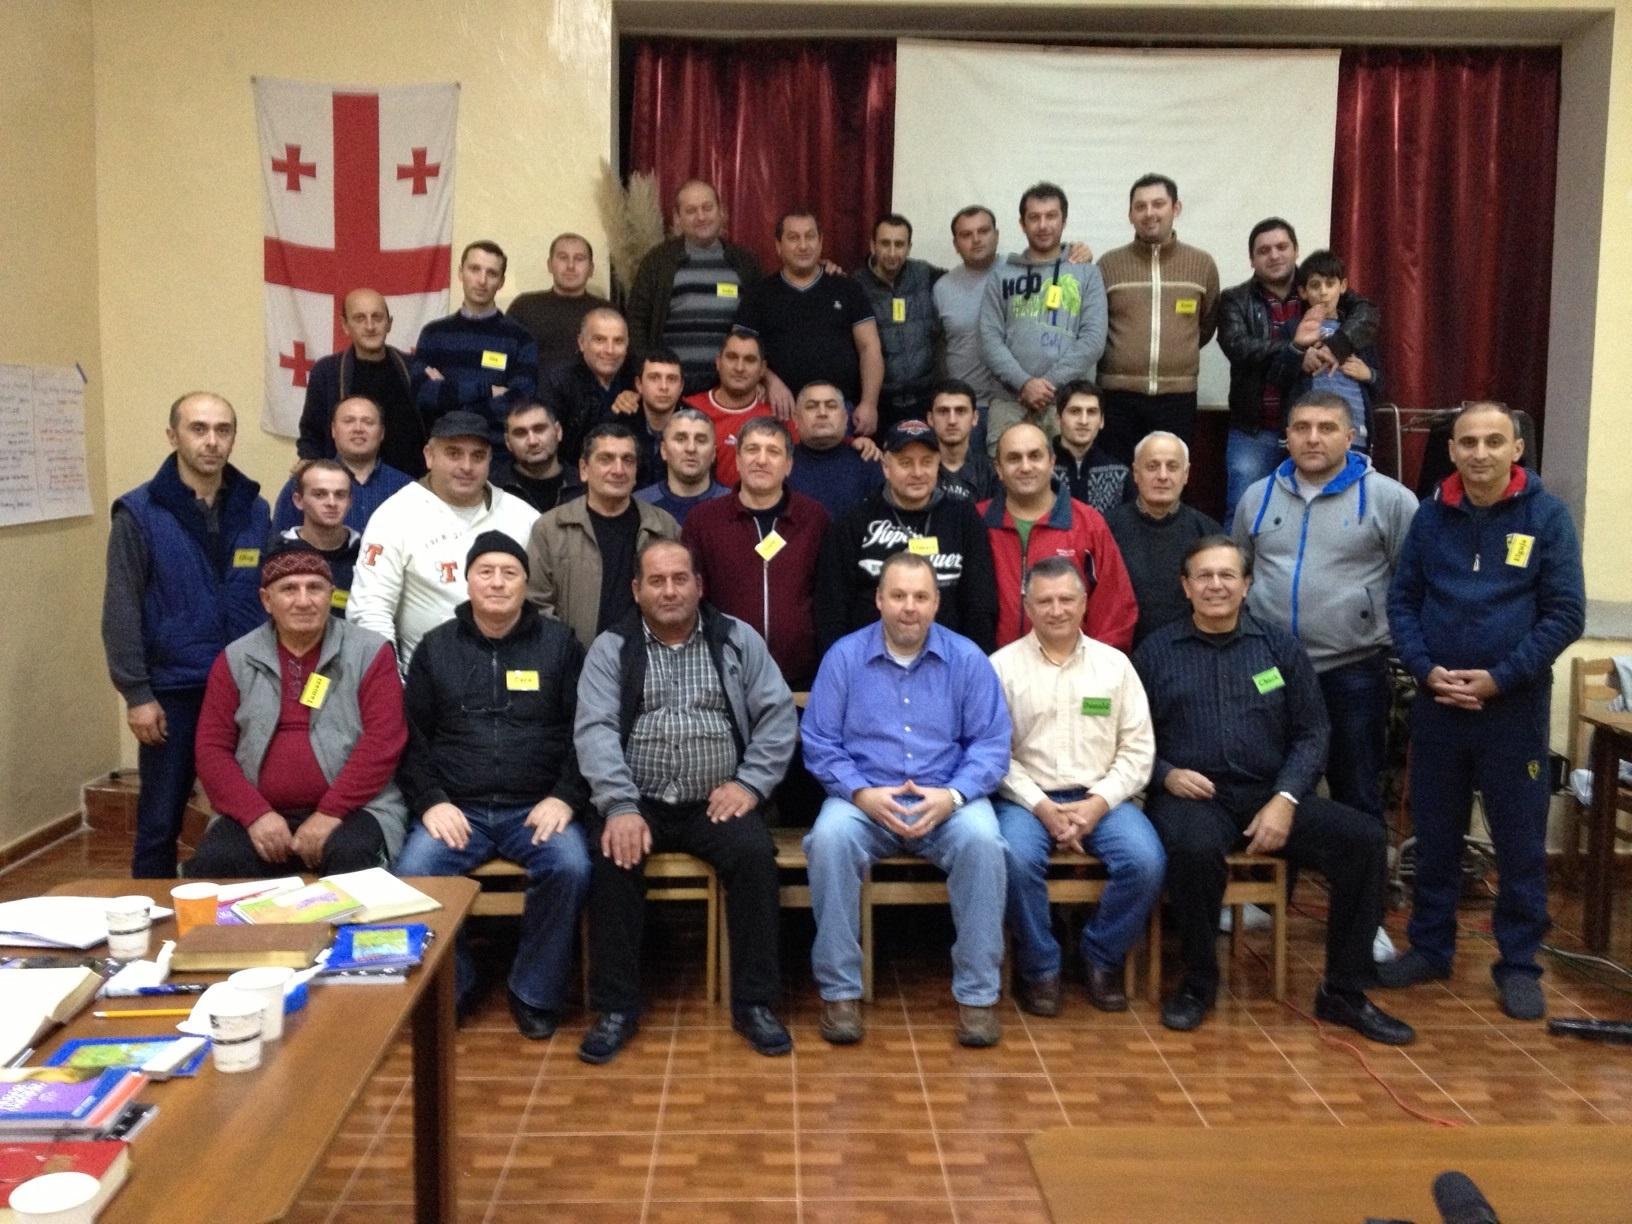 Church Planting Conference Nov 2014.jpg